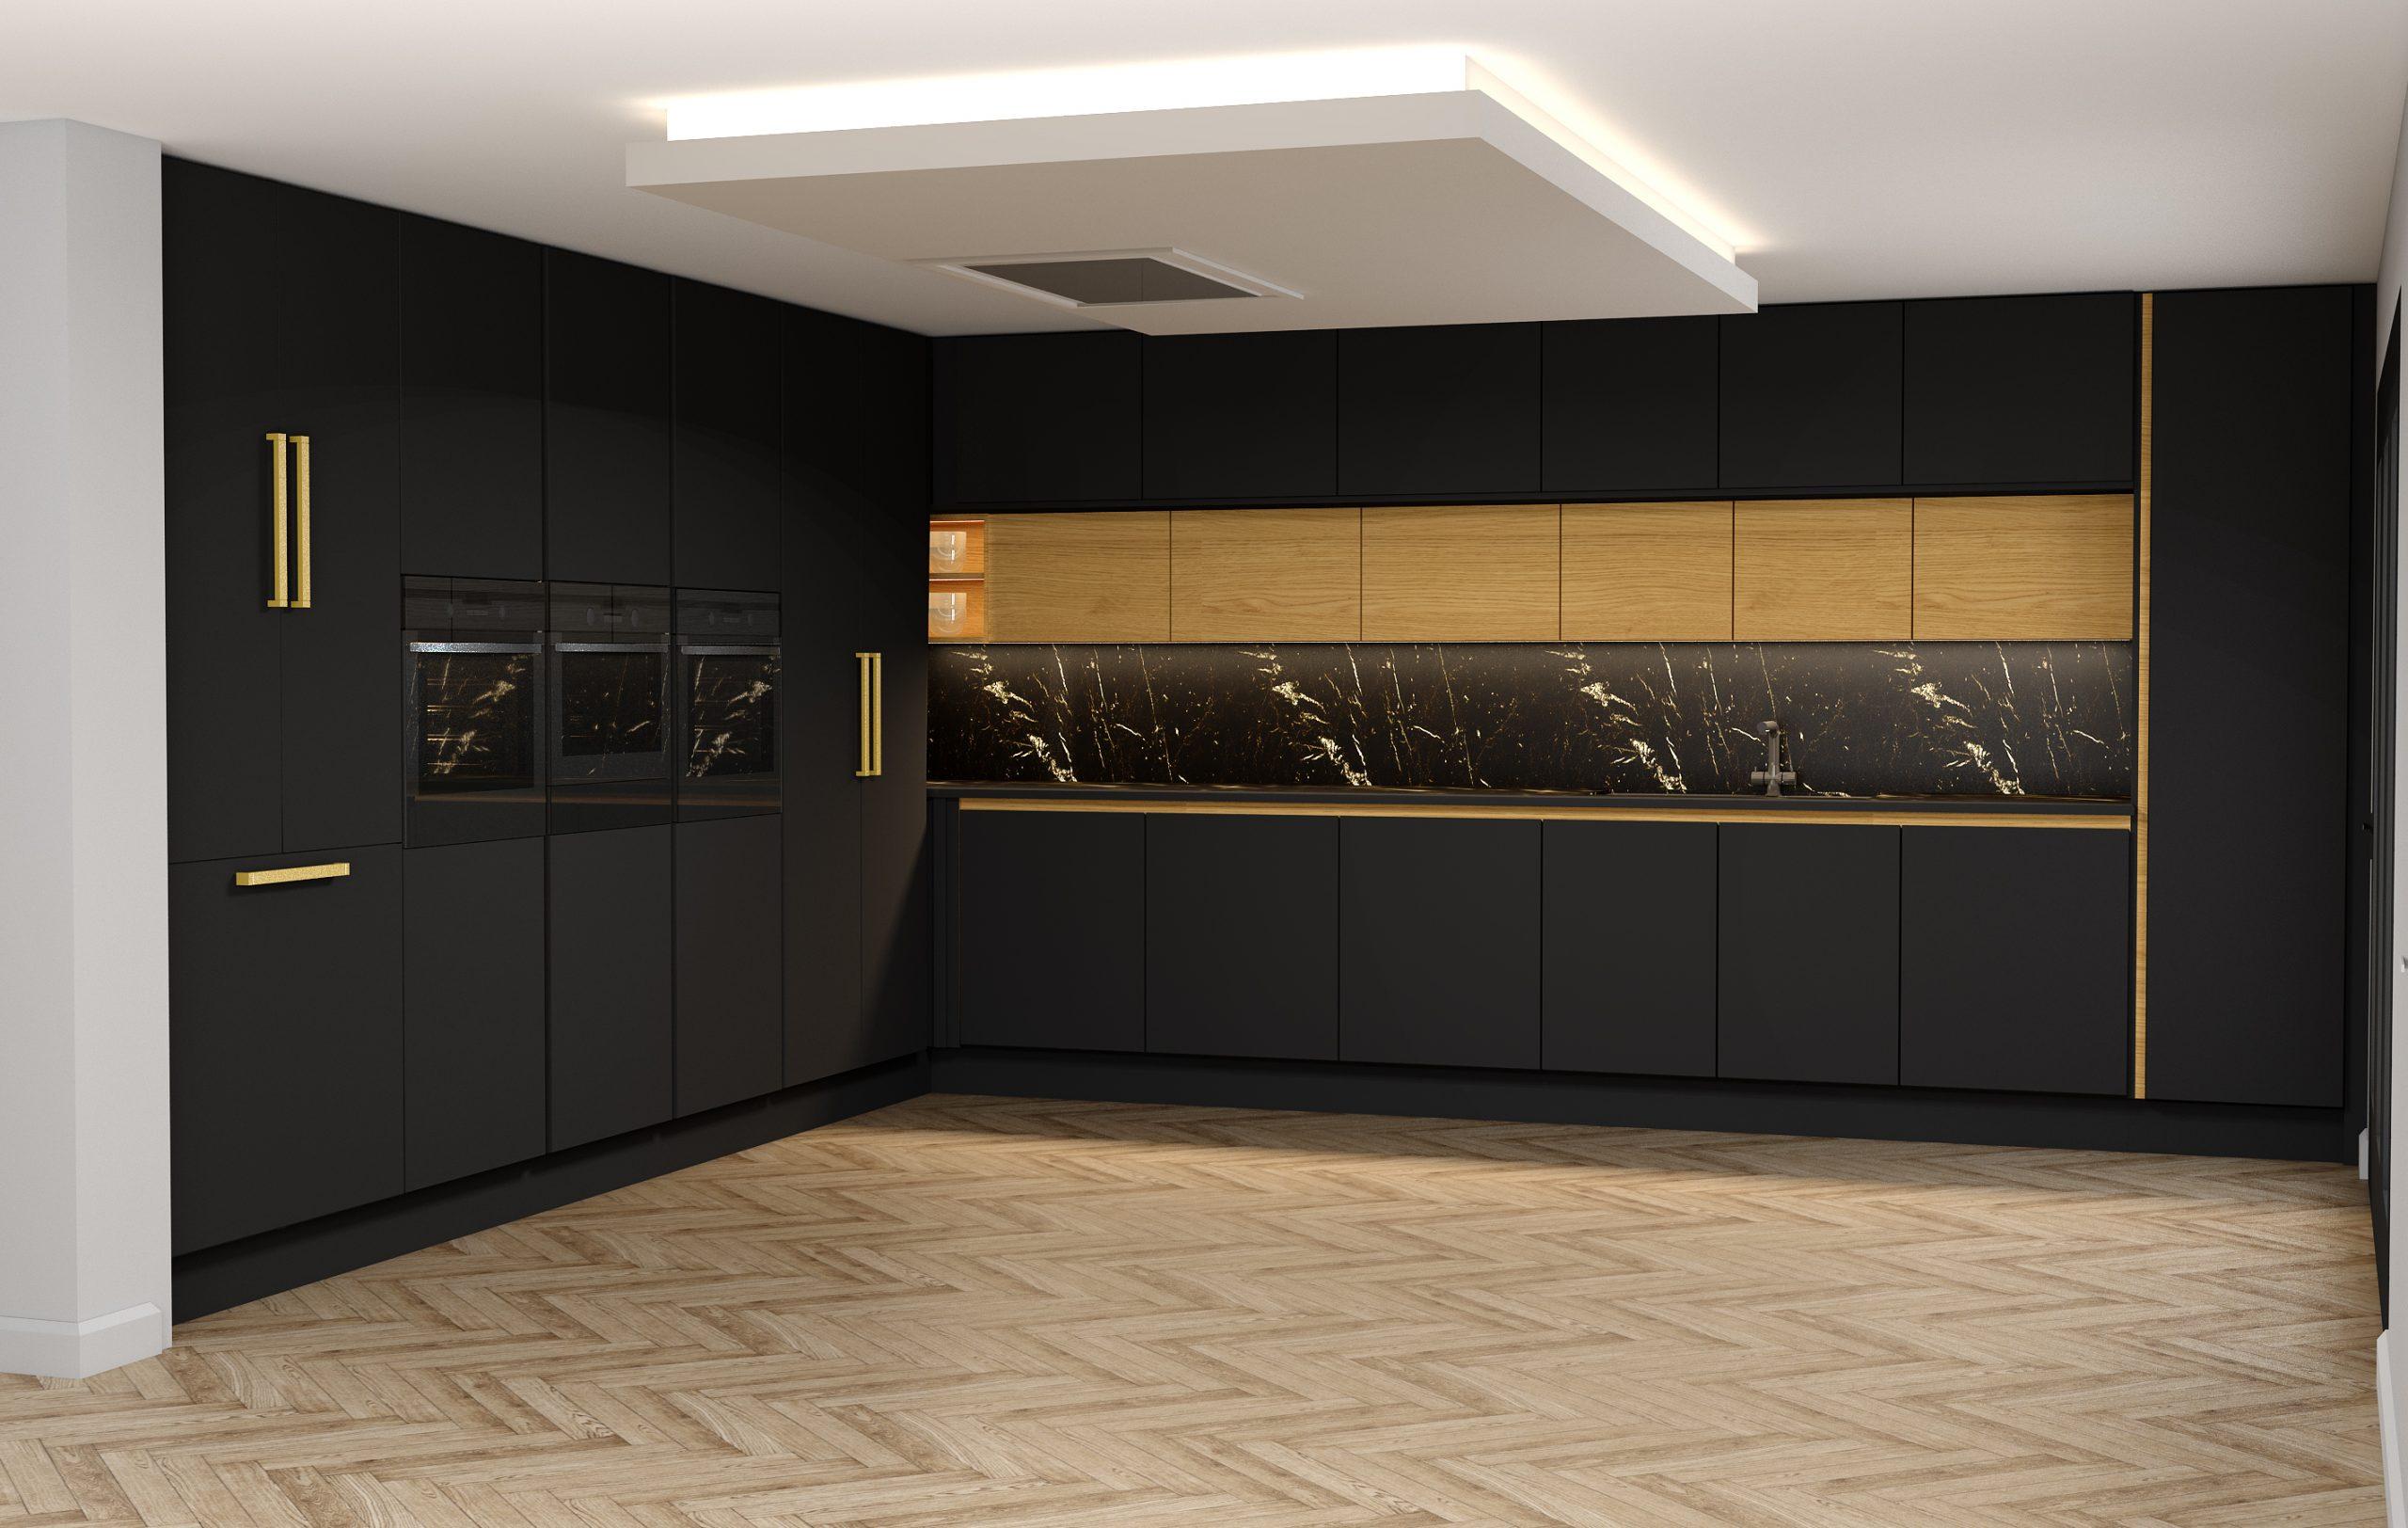 Handlless Kitchen withisland in black matt and woodgrain finish gold handleprofile_1 (1)